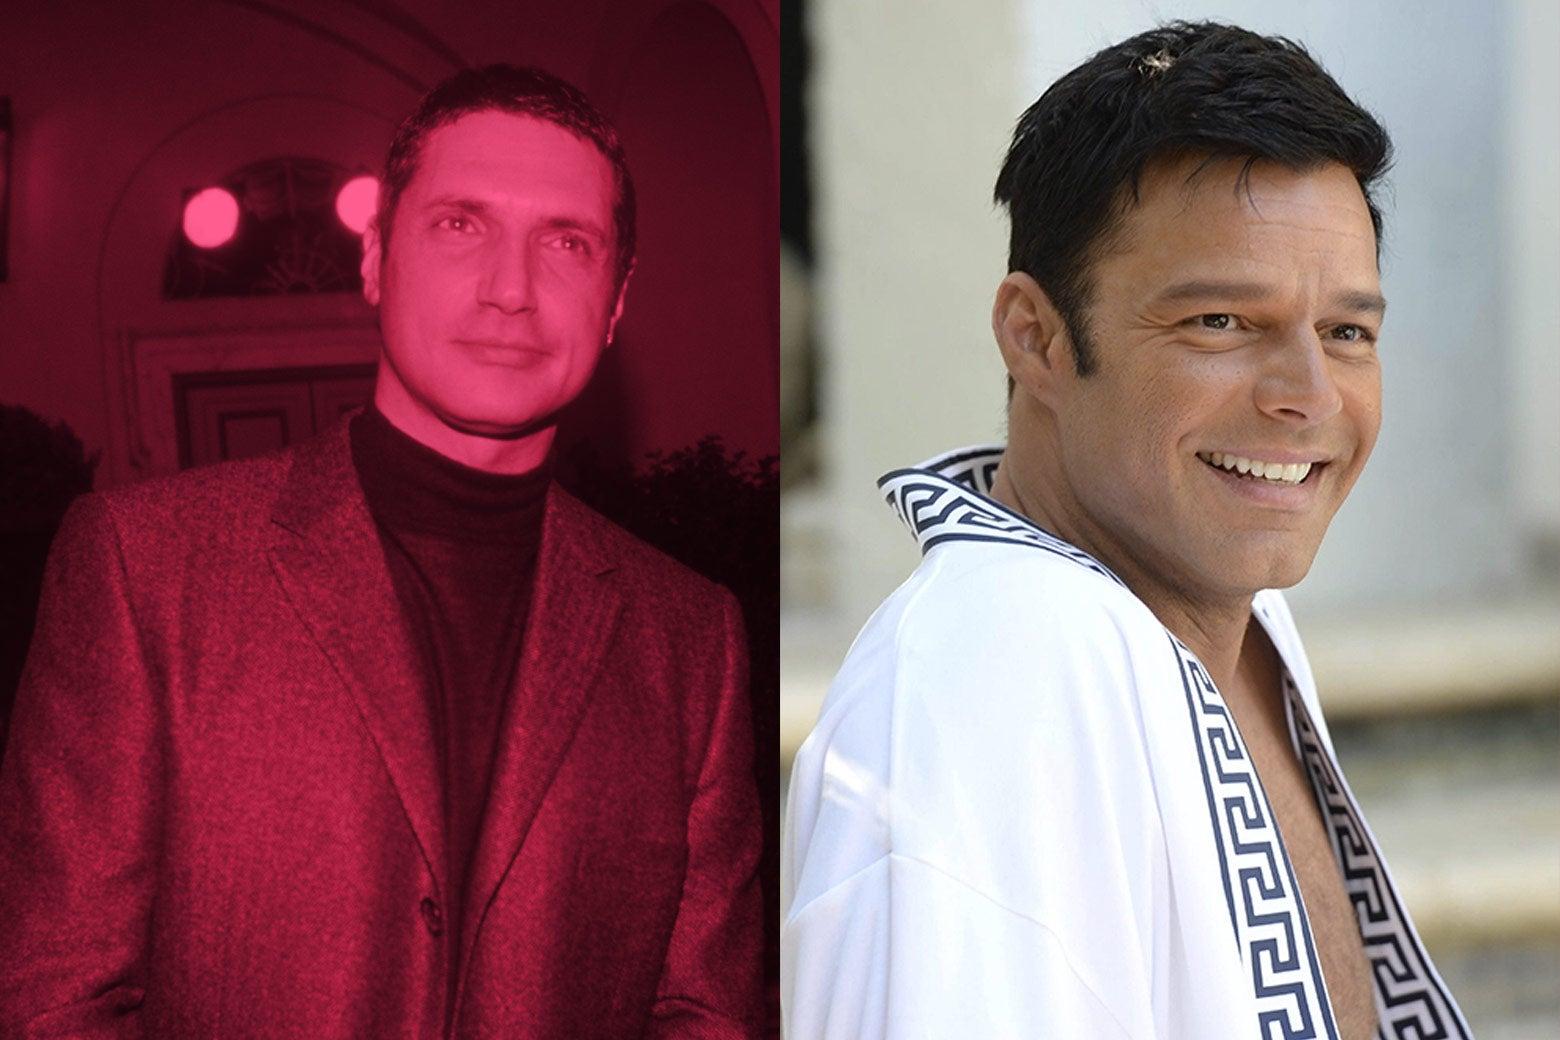 Antonio D'Amico and Ricky Martin as D'Amico.